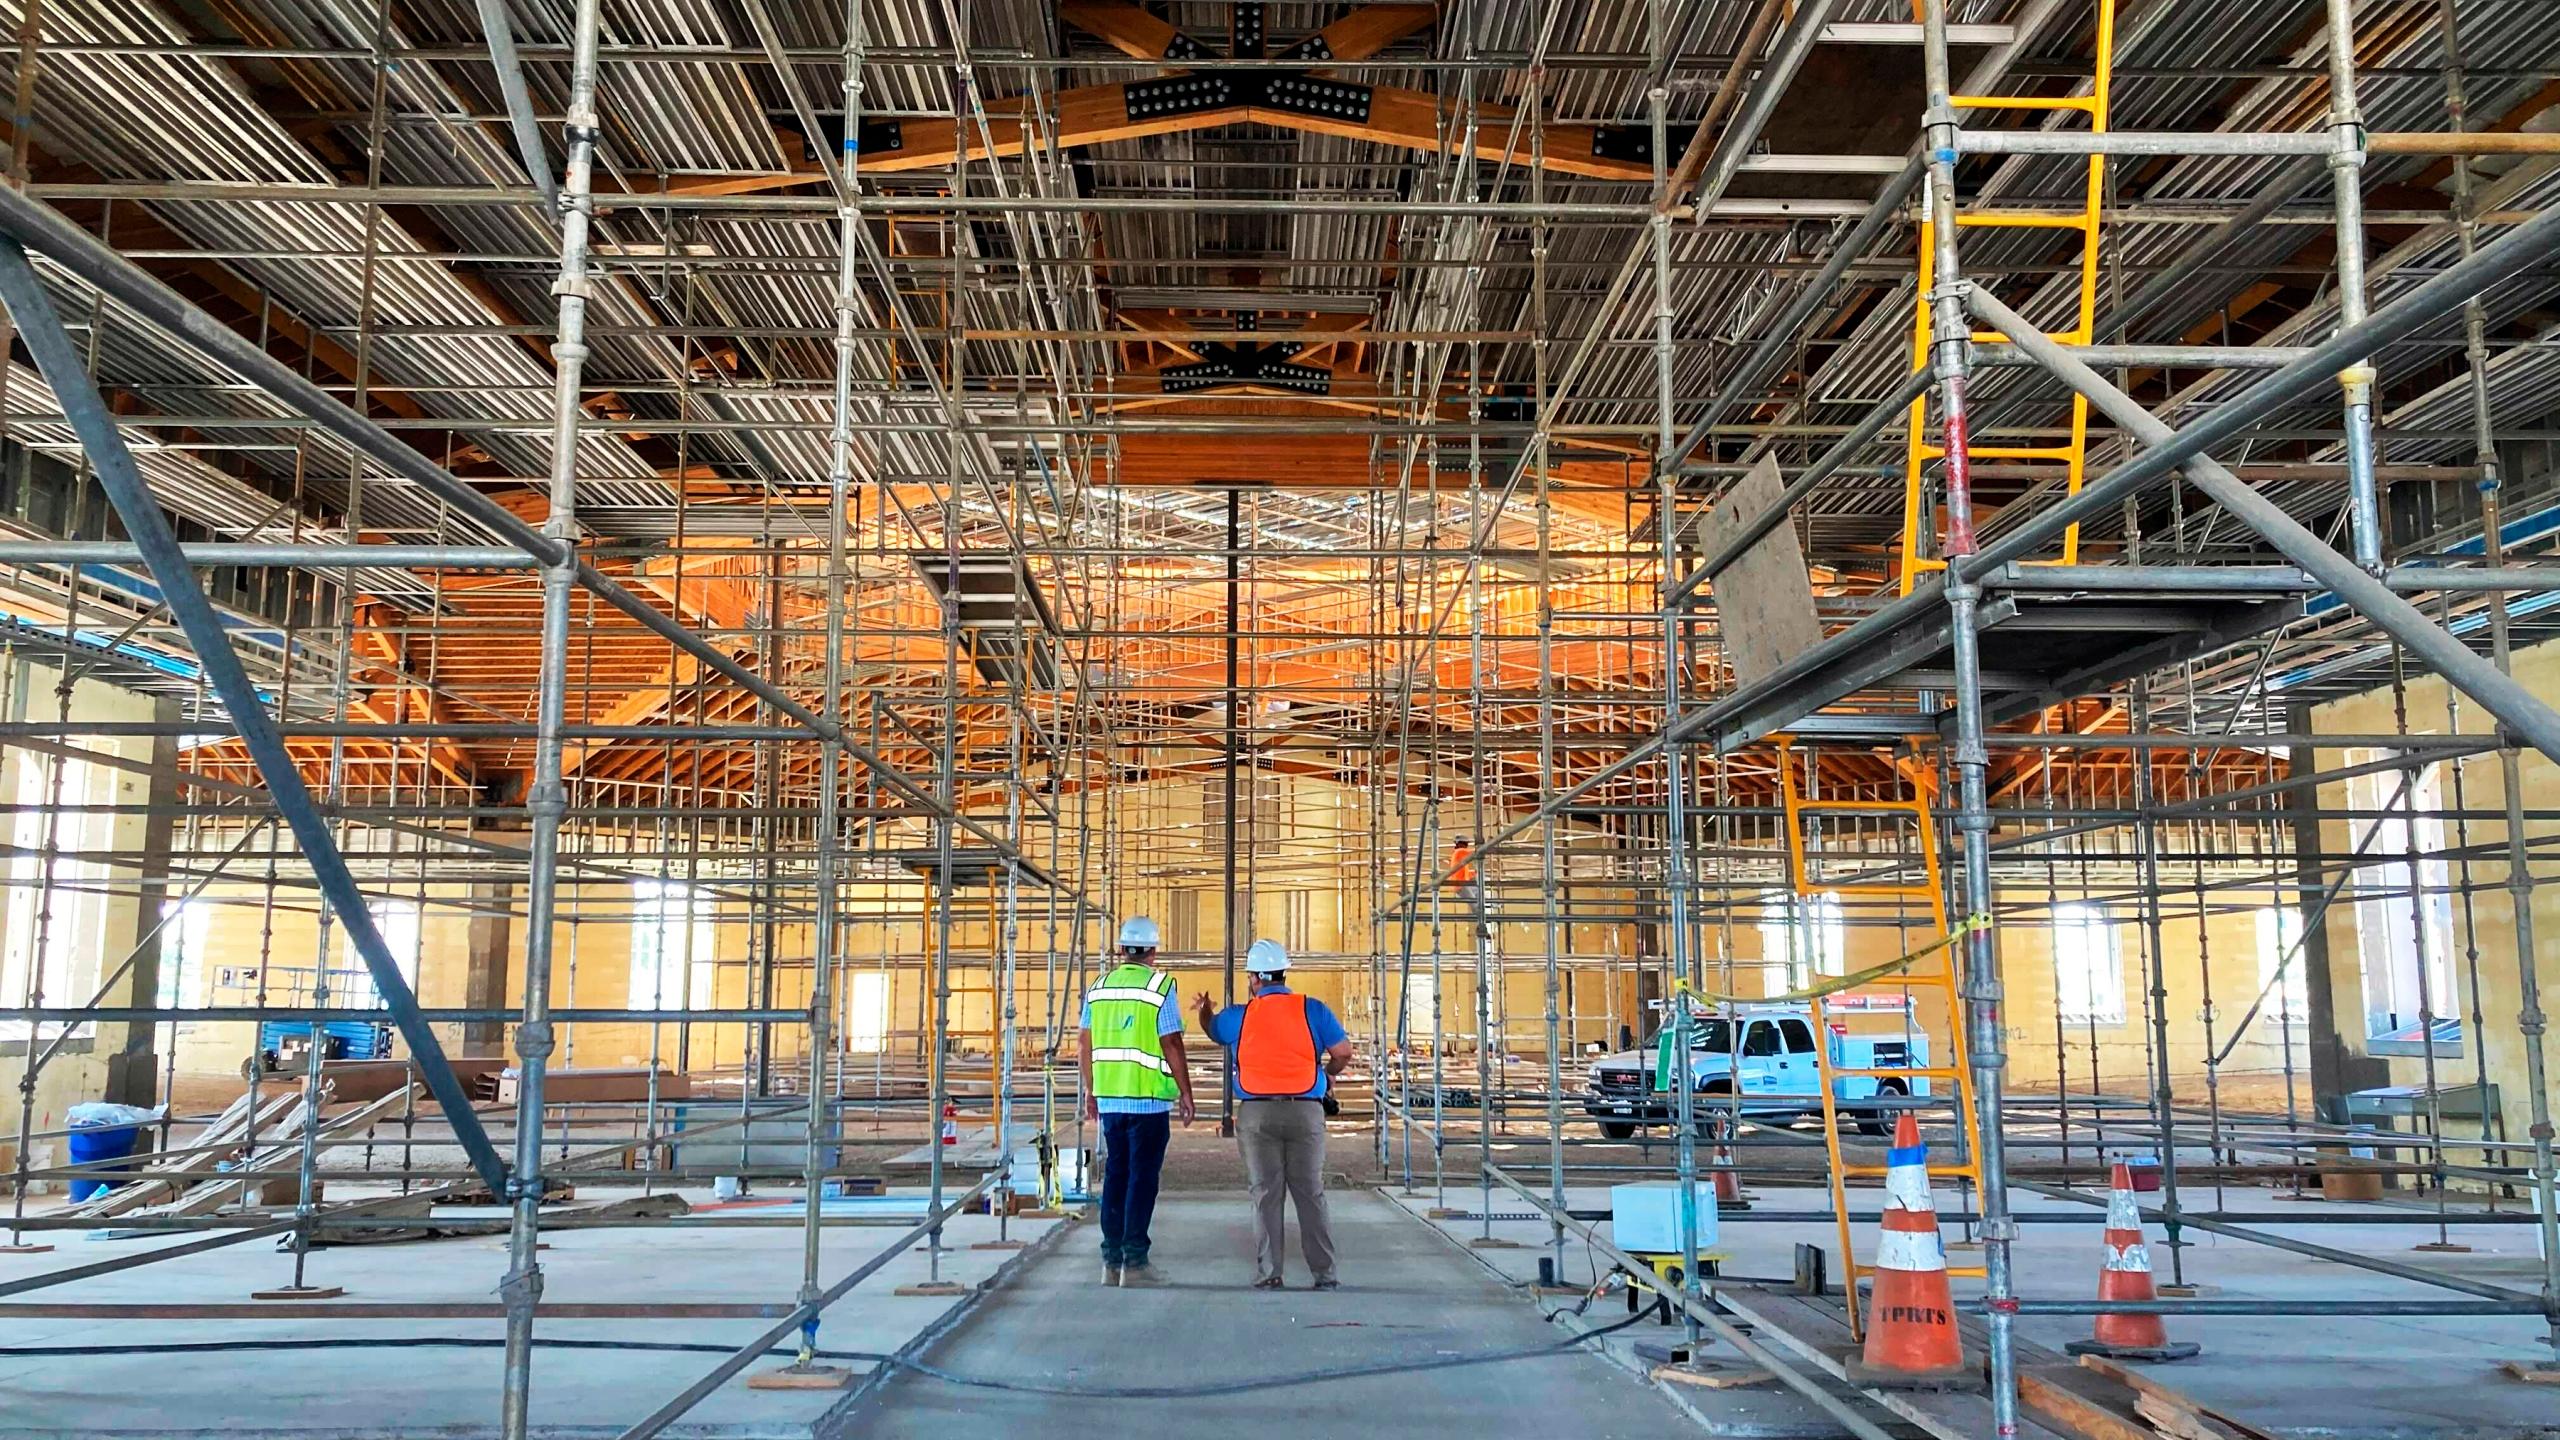 The interior of the St. Charles Borromeo Catholic Church construction site in Visalia, Calif., on Aug. 26, 2021. (Alejandra Molina/RNS via Associated Press)